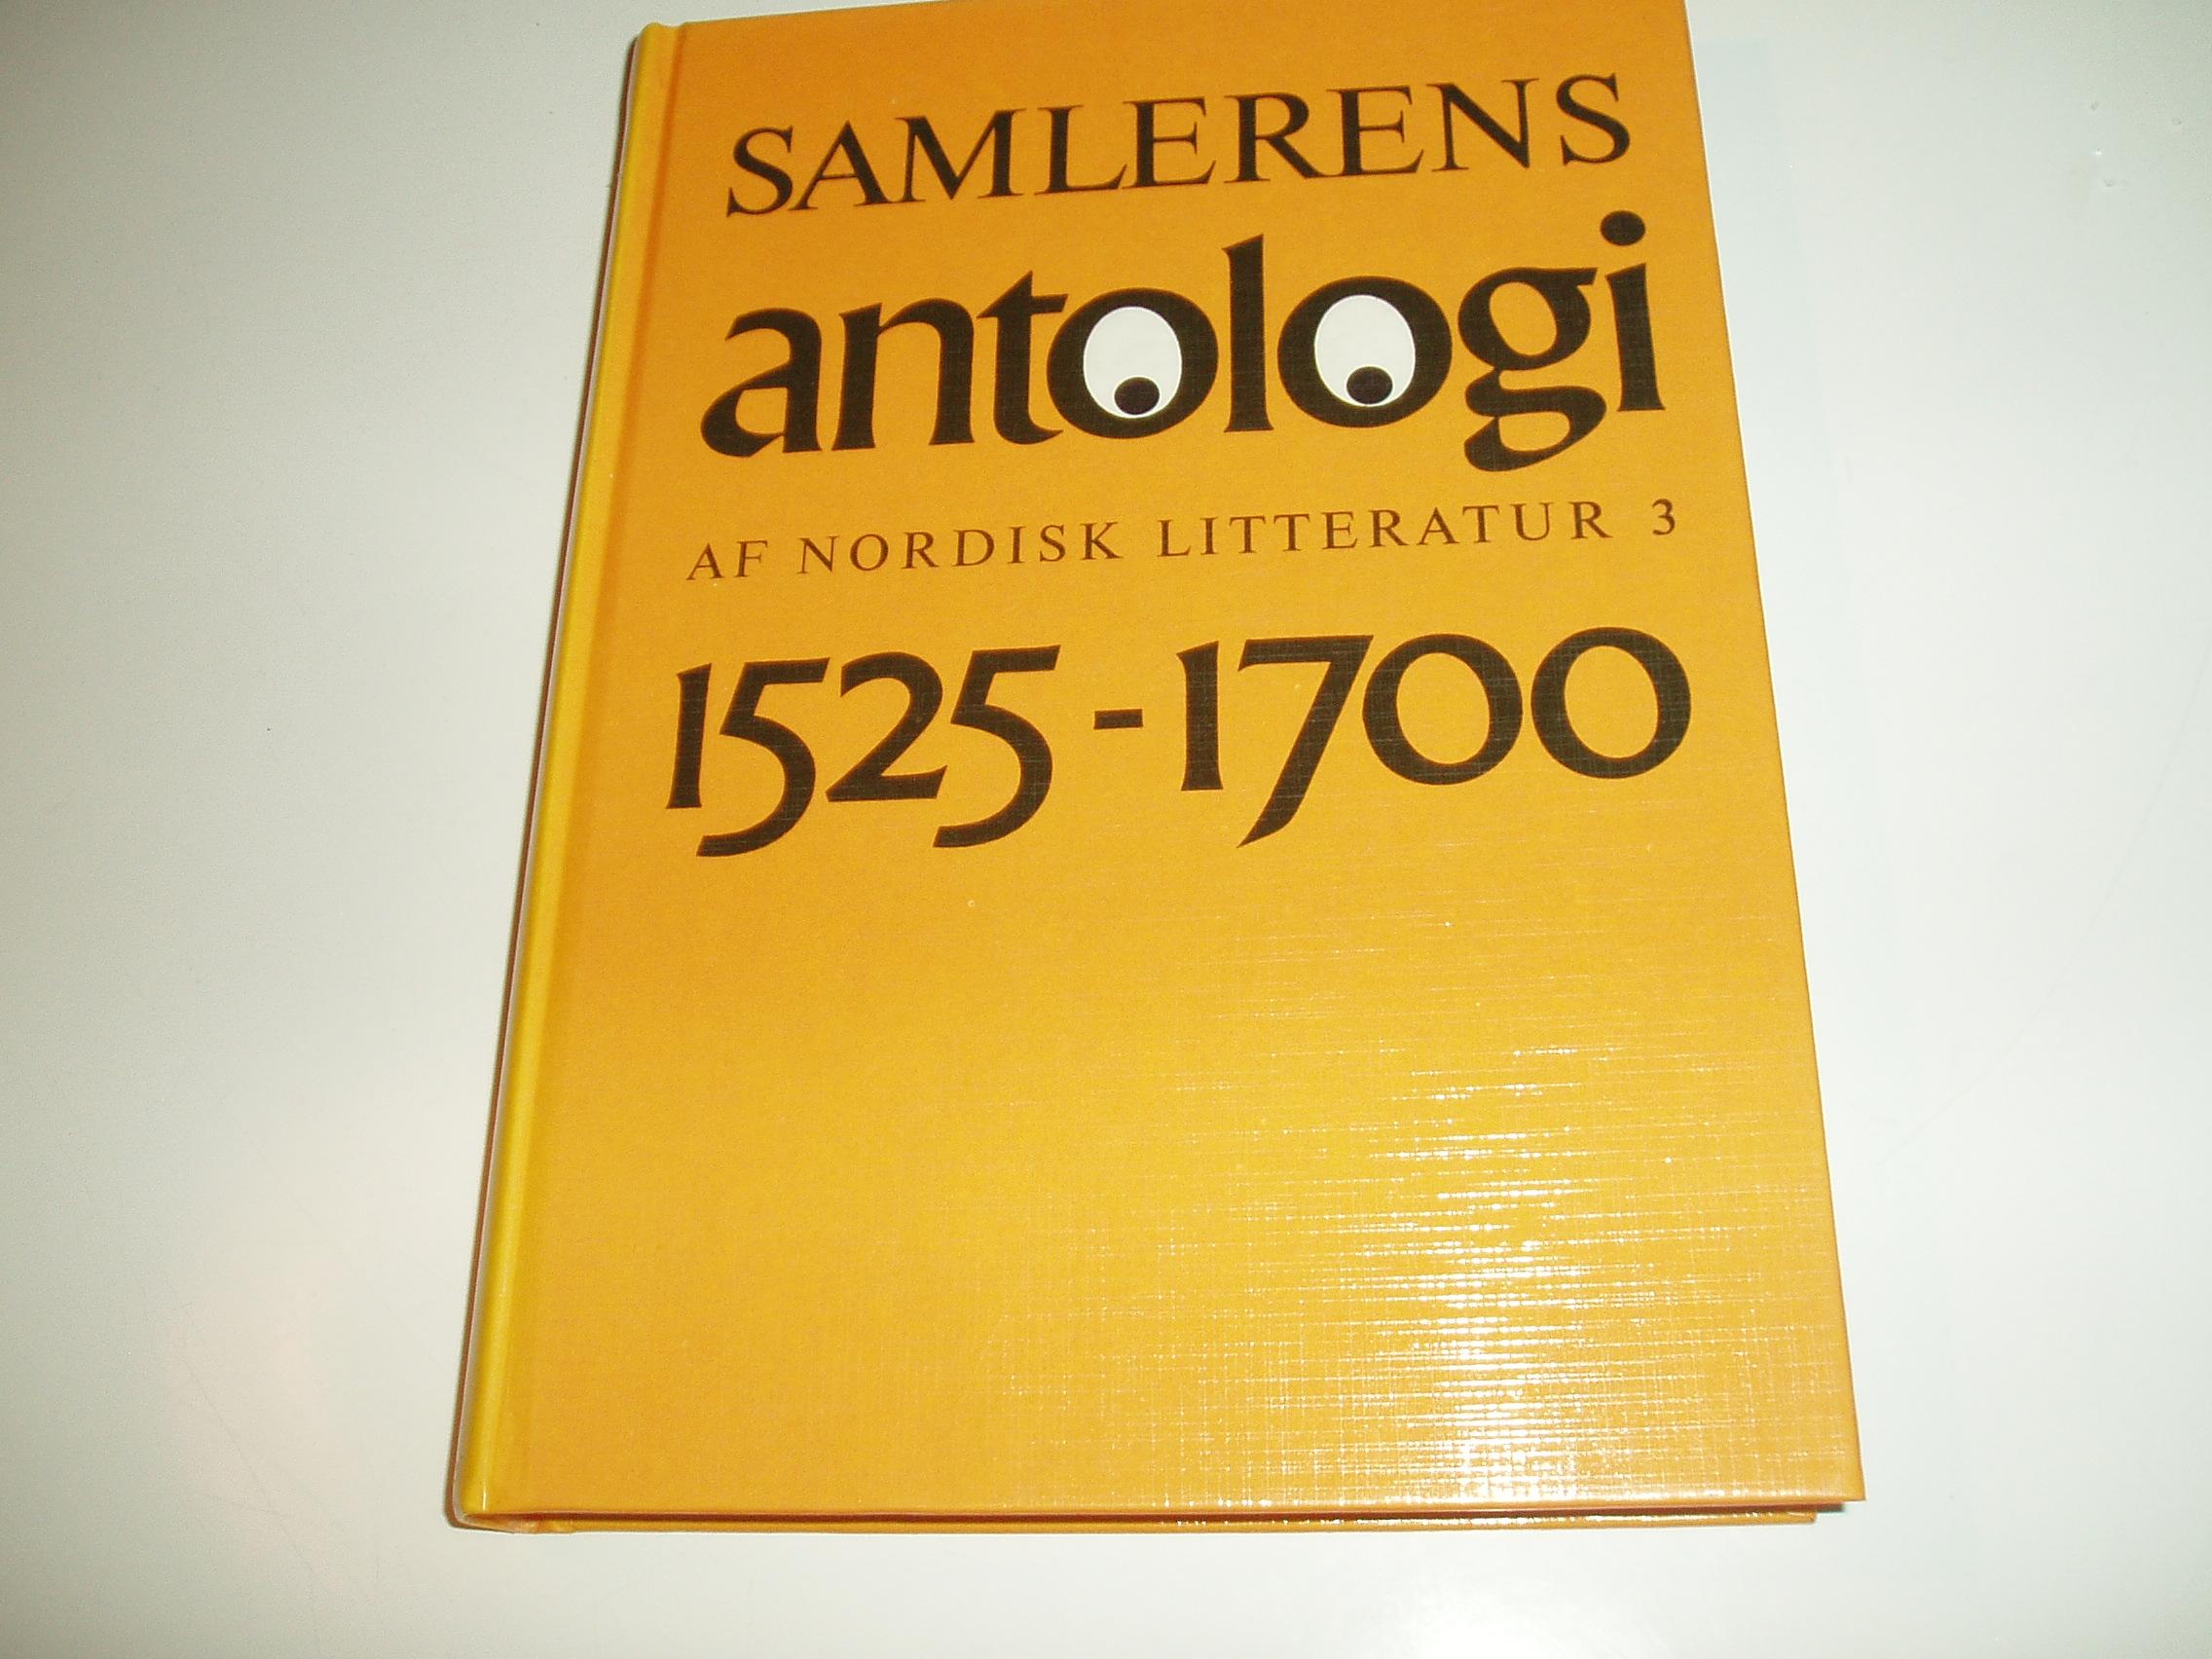 Antologi af nordisk litteratur, bind 3. Perioden 1525-1700 (Saml